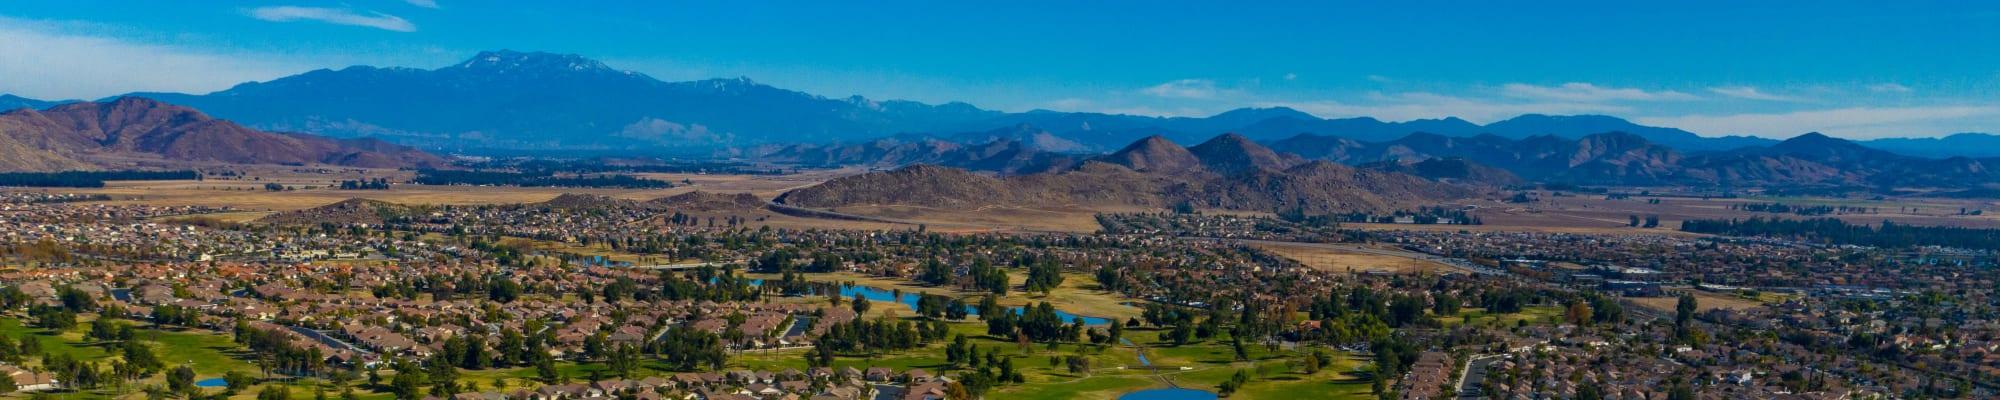 Photo tour of WellQuest of Menifee Lakes in Menifee, California